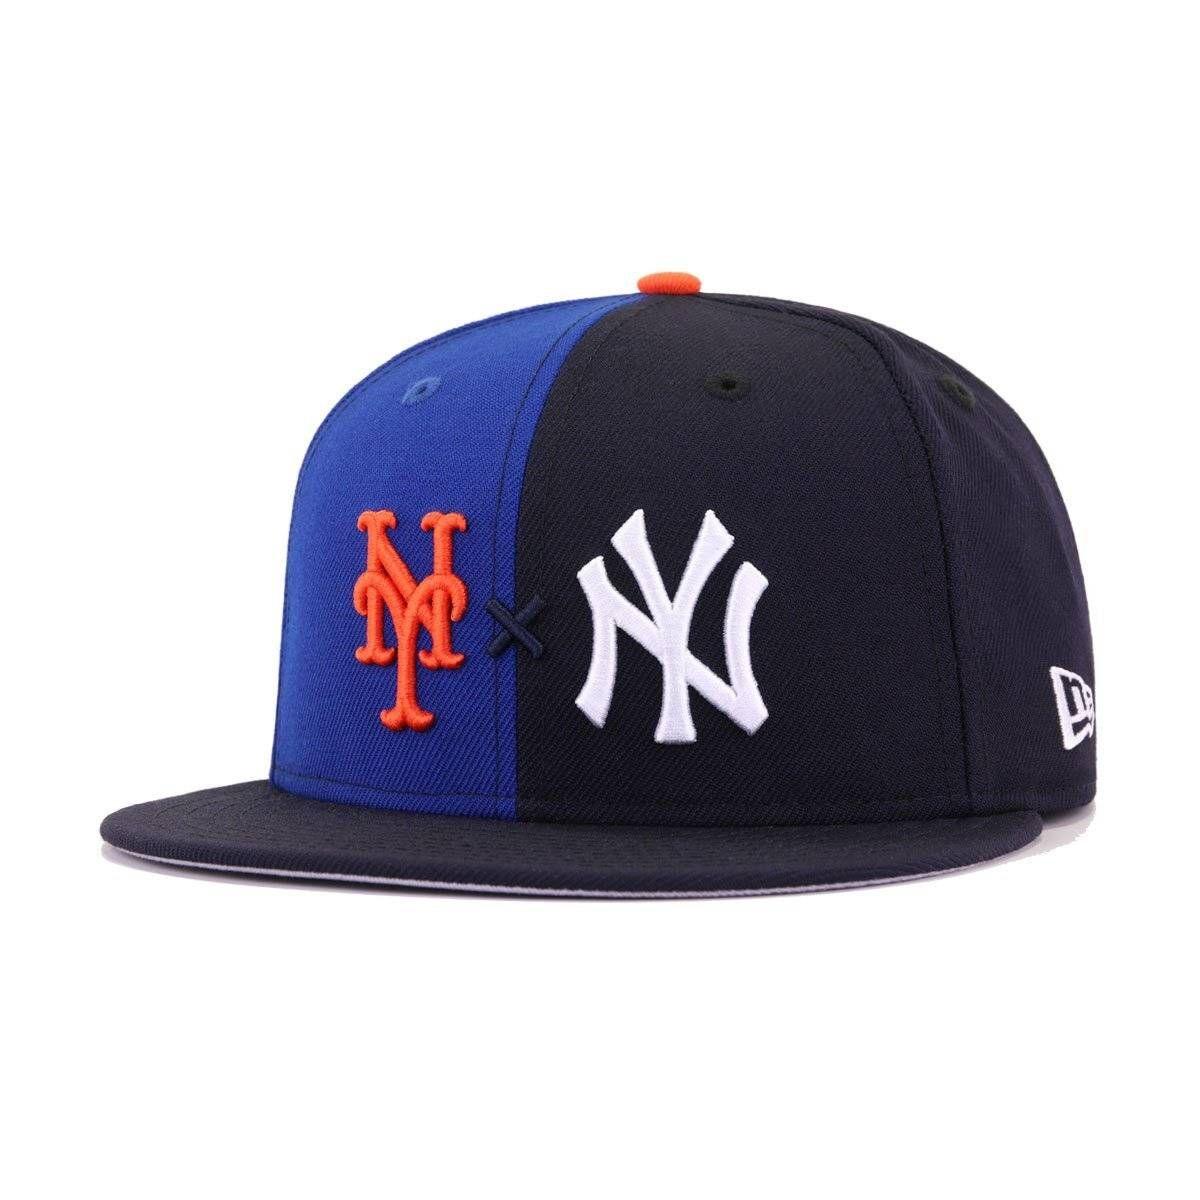 New York Yankees X New York Mets X Hat Heaven Navy Light Royal Blue Subway Series New Era 9fifty Snapback Subway Series New York Mets New York Yankees